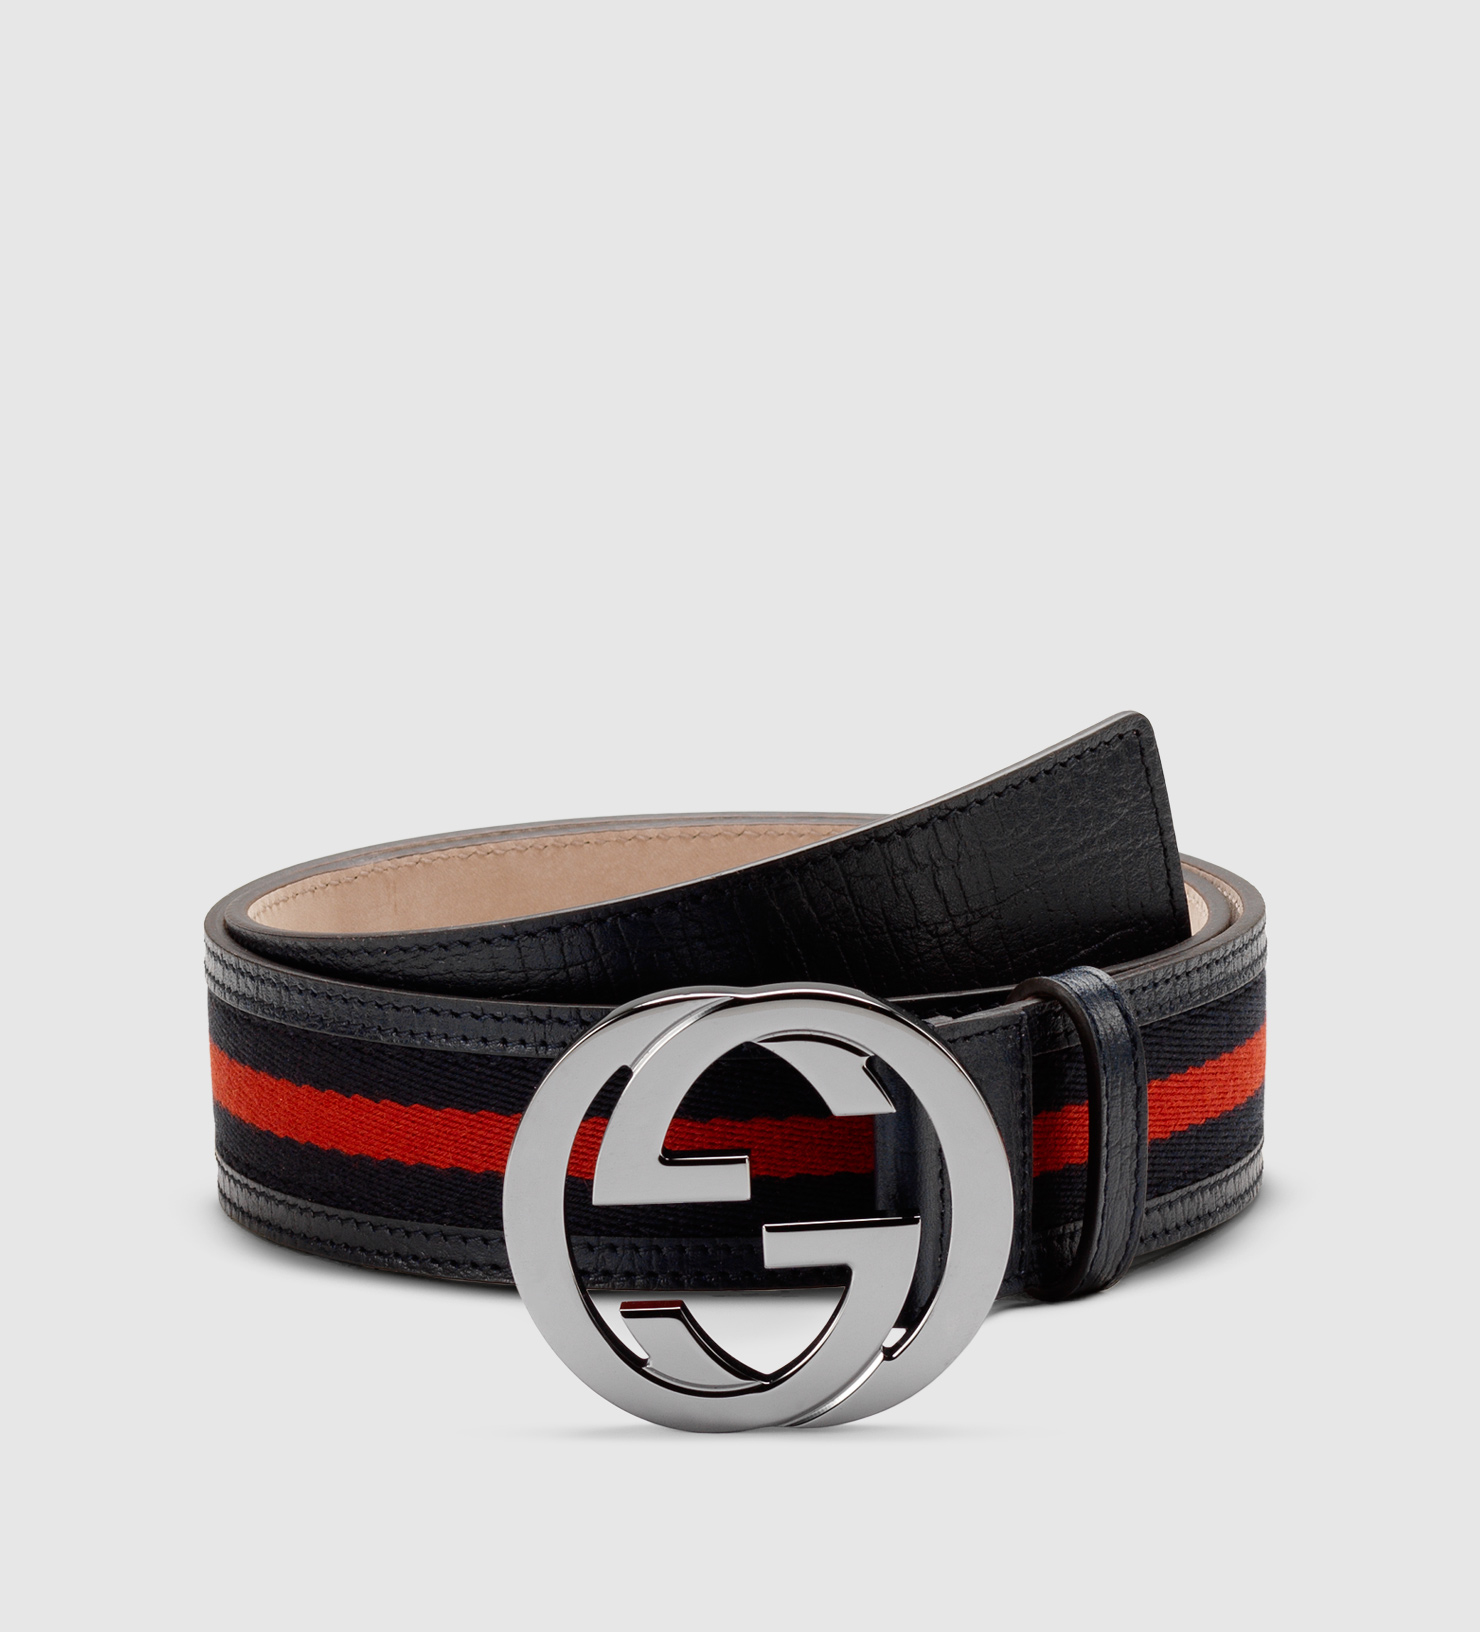 7f9a8b5b1dac Gucci Signature Web Belt With Interlocking G Buckle in Black for Men ...